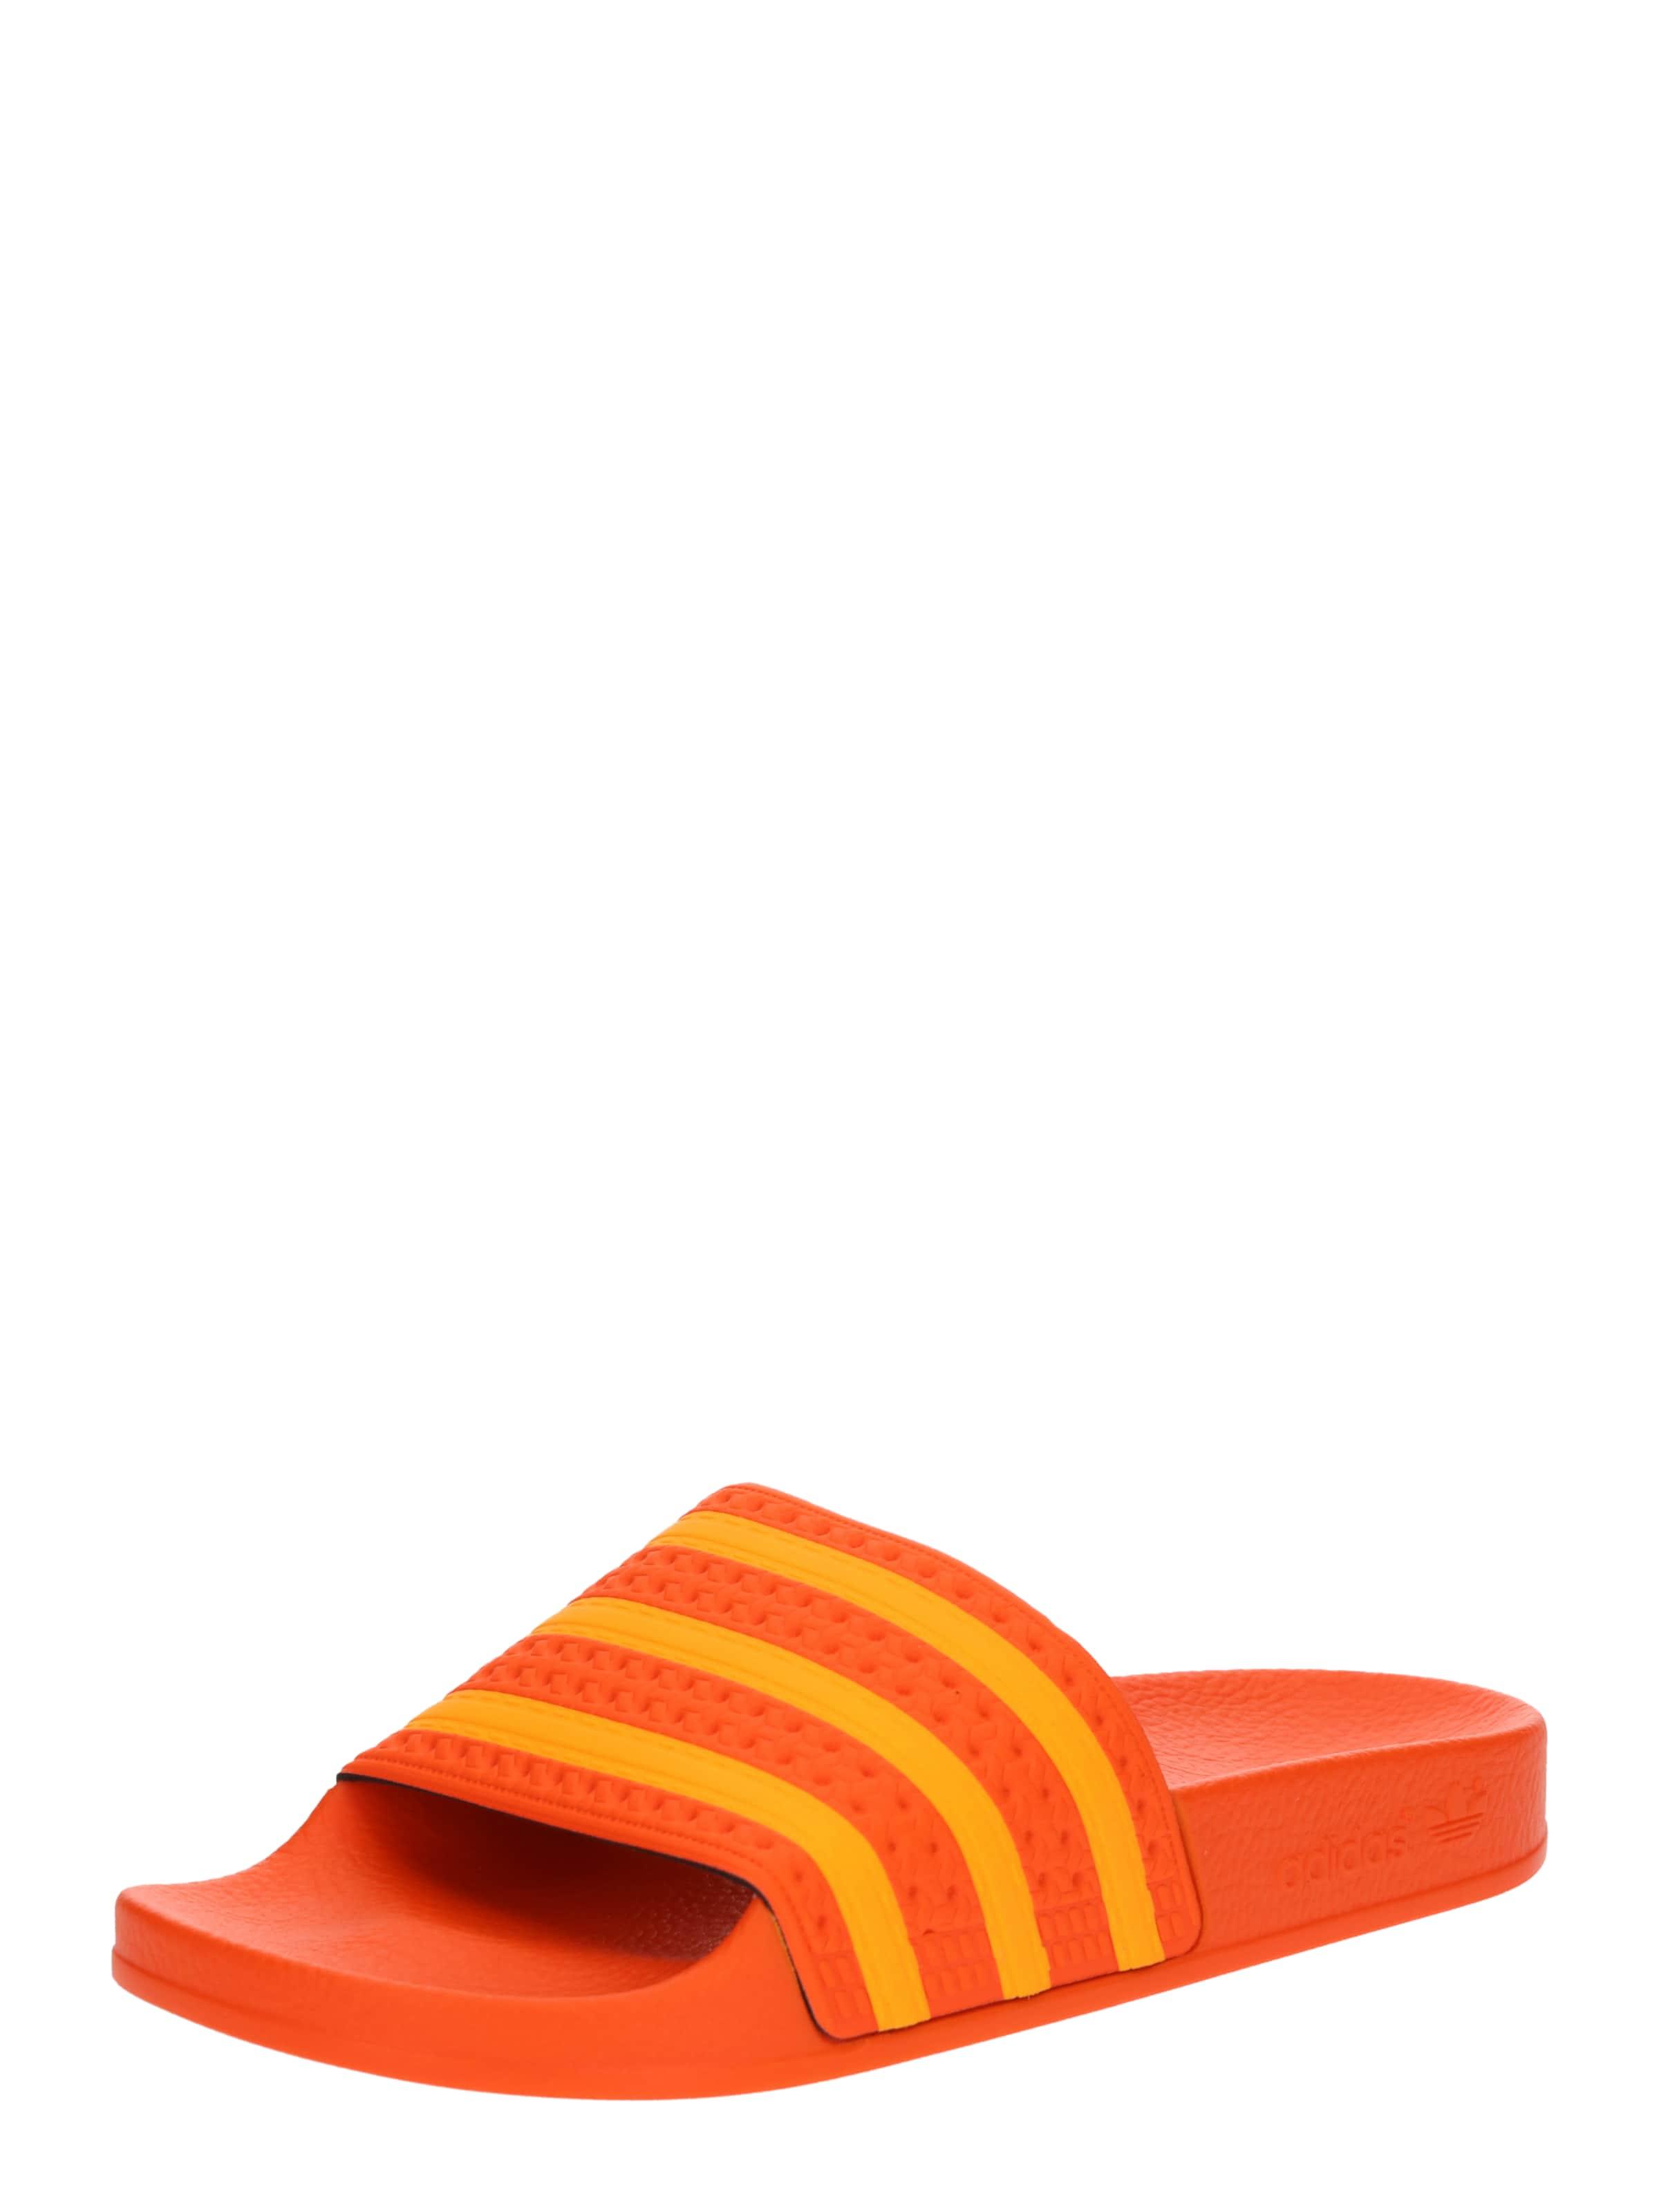 Mule Originals Adidas En Orange 'adilette' 54A3jLR